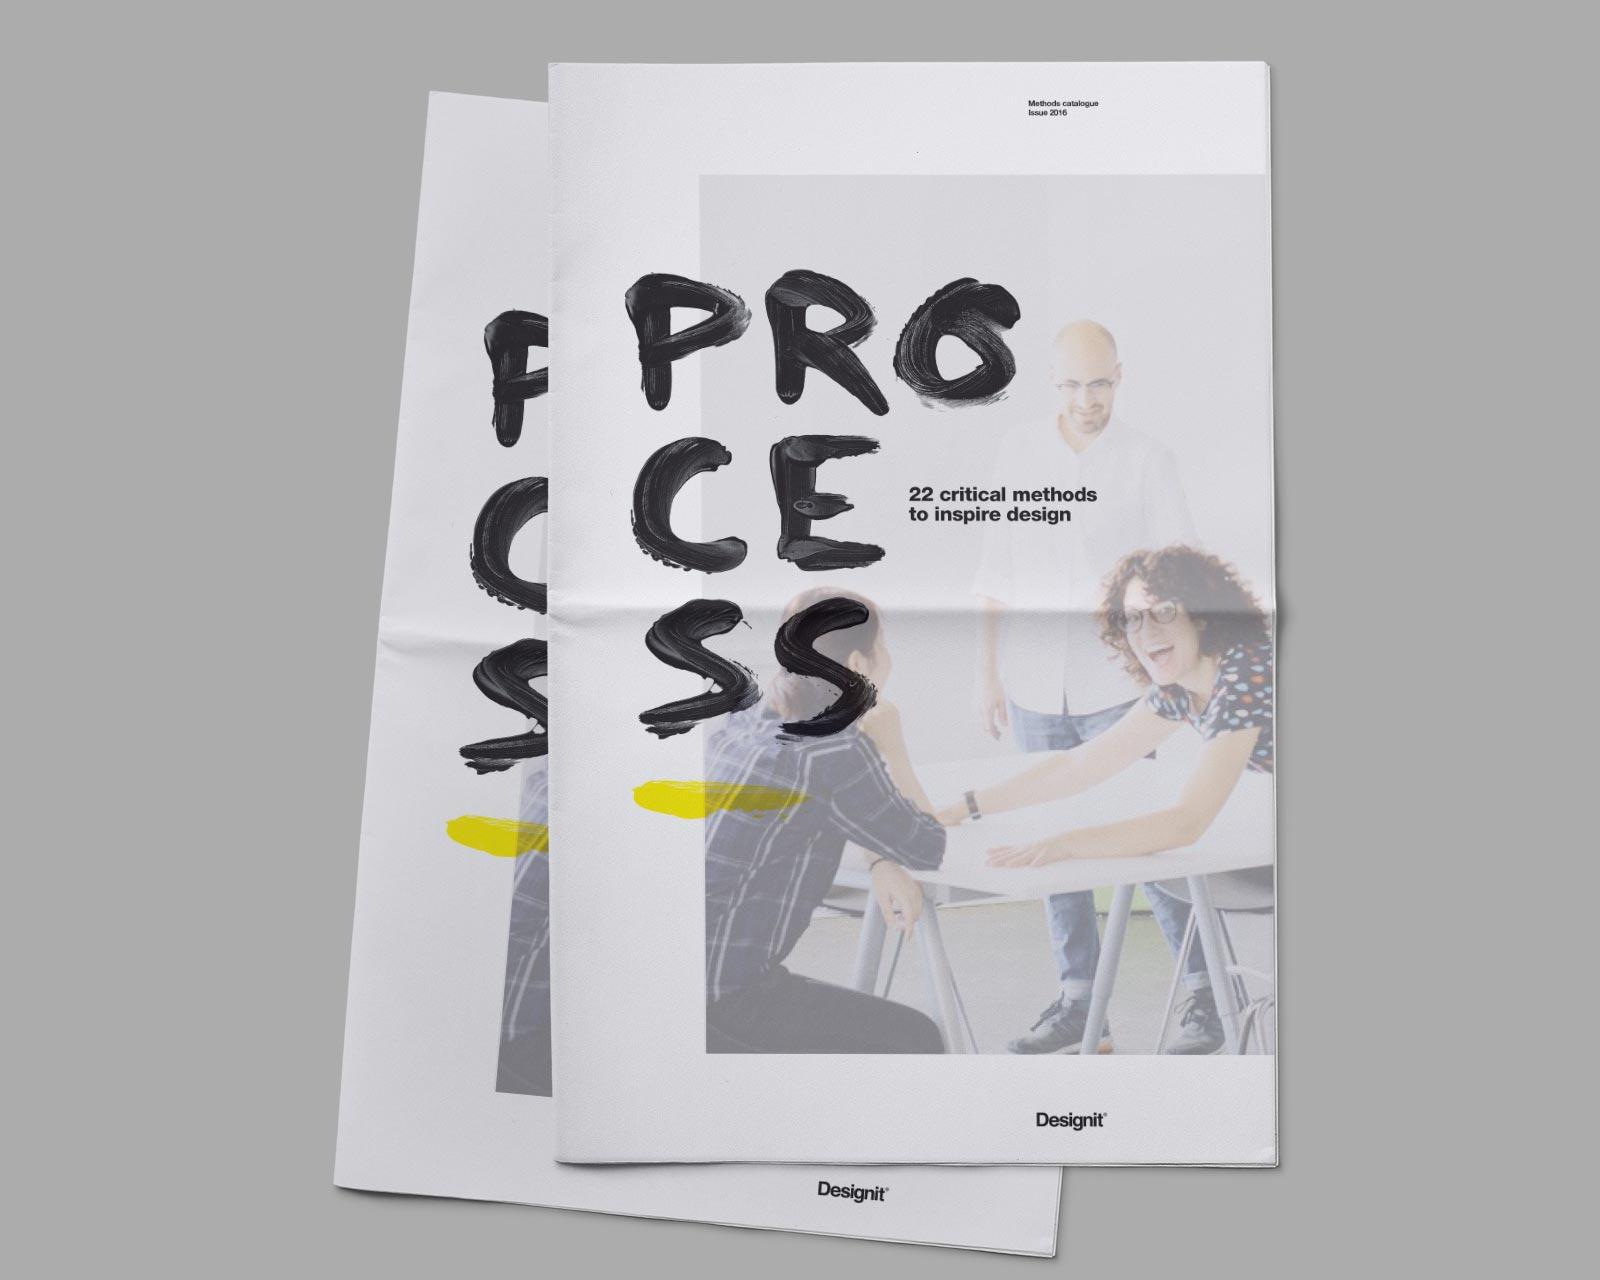 designitprocess-02-sinisalminen-08c